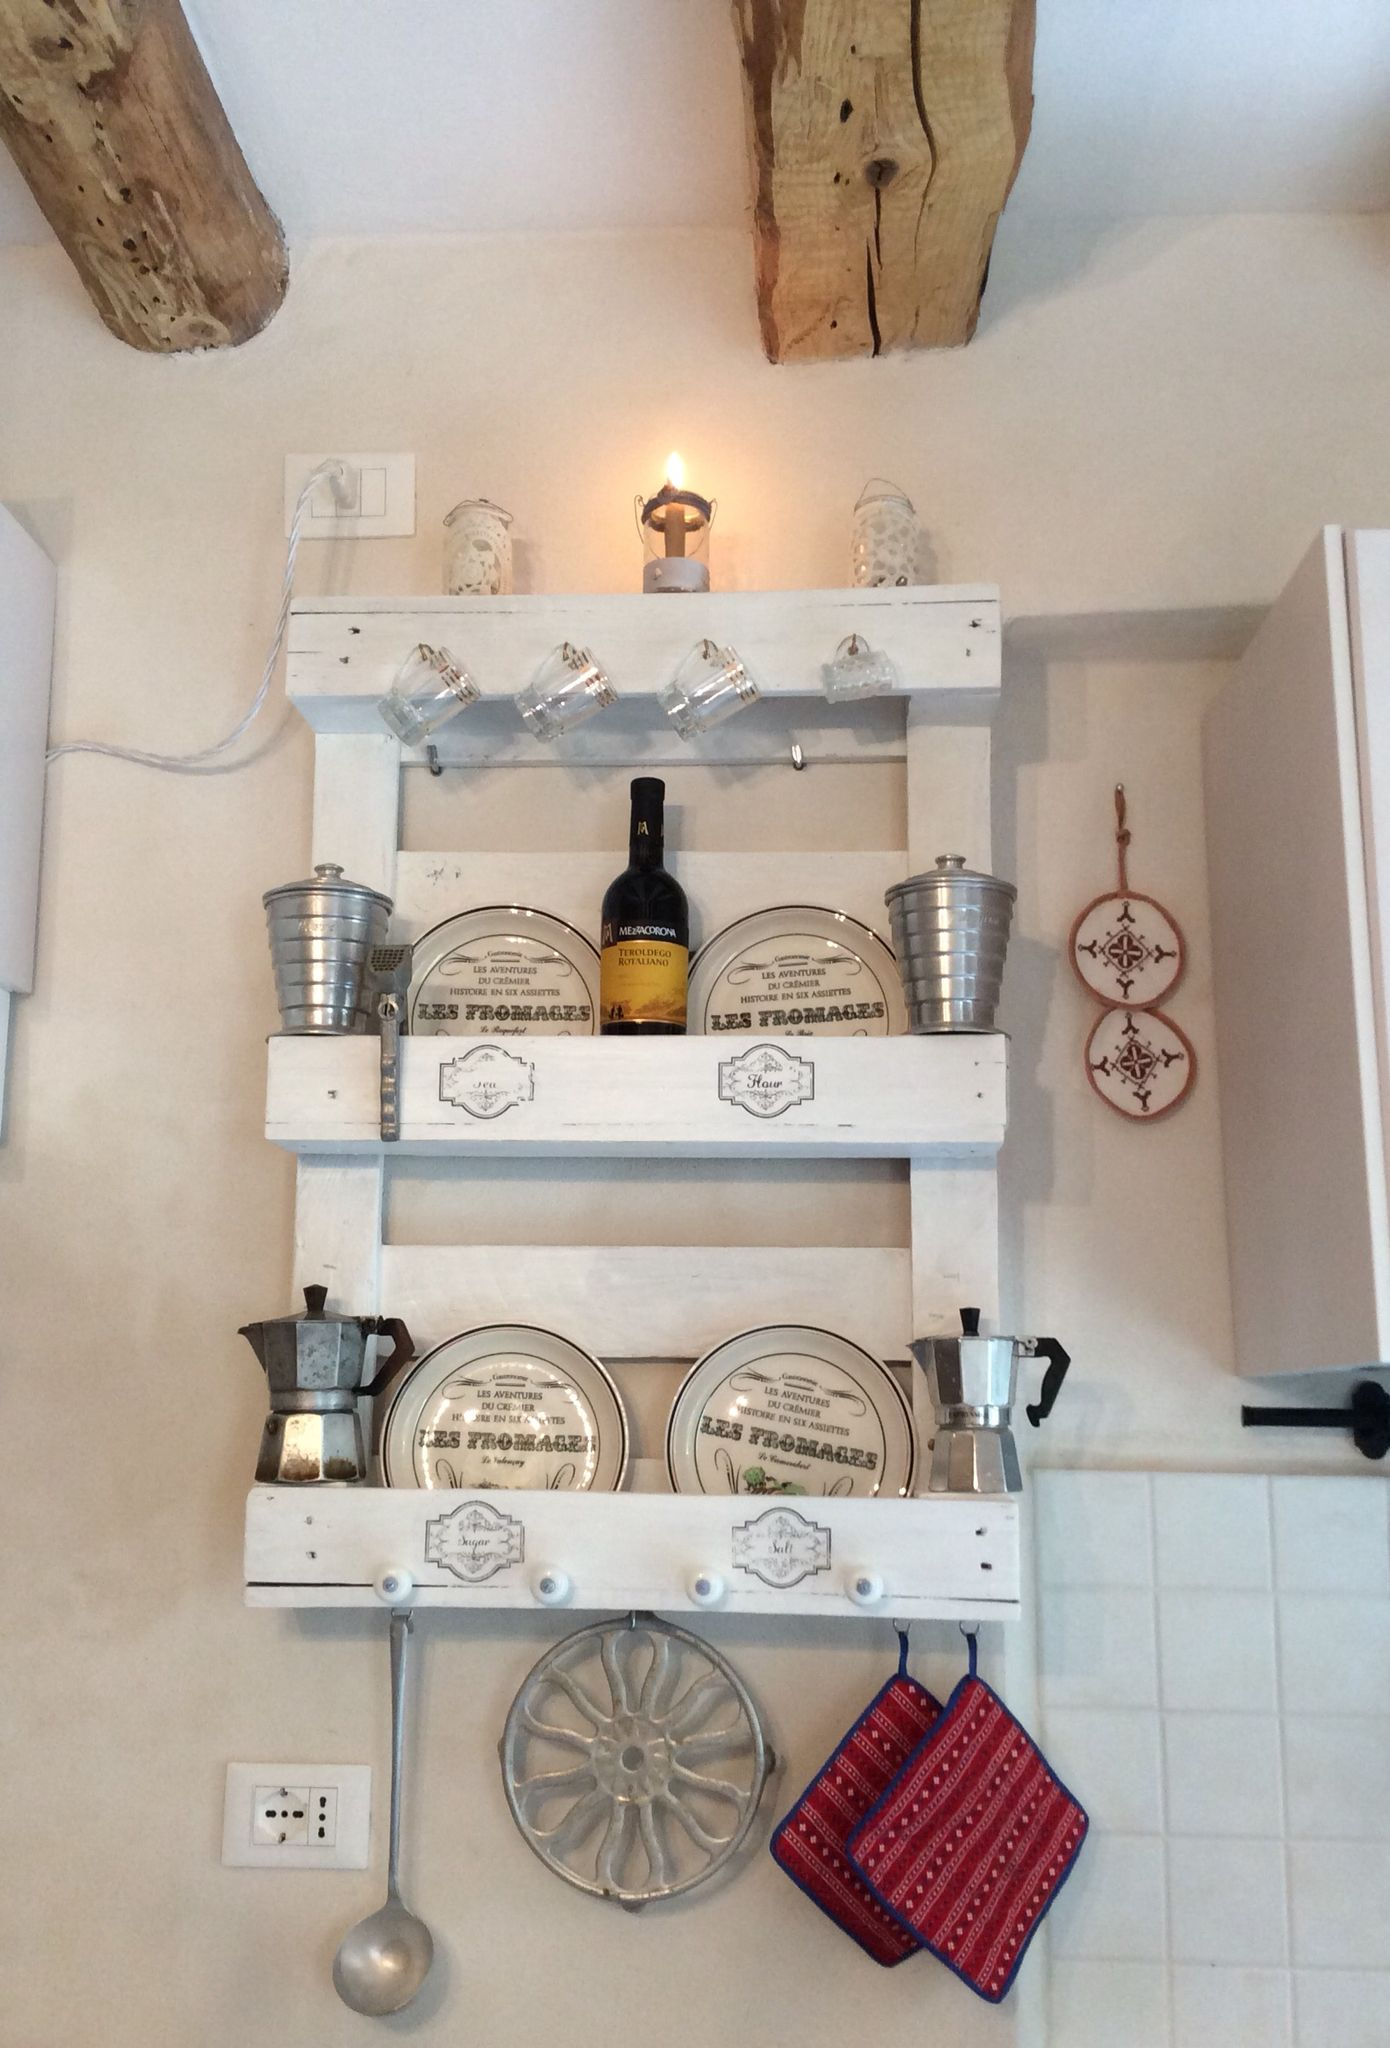 Cucina Pallet Fai Da Te pallet per arredare la cucina! ecco 15 idee creative per